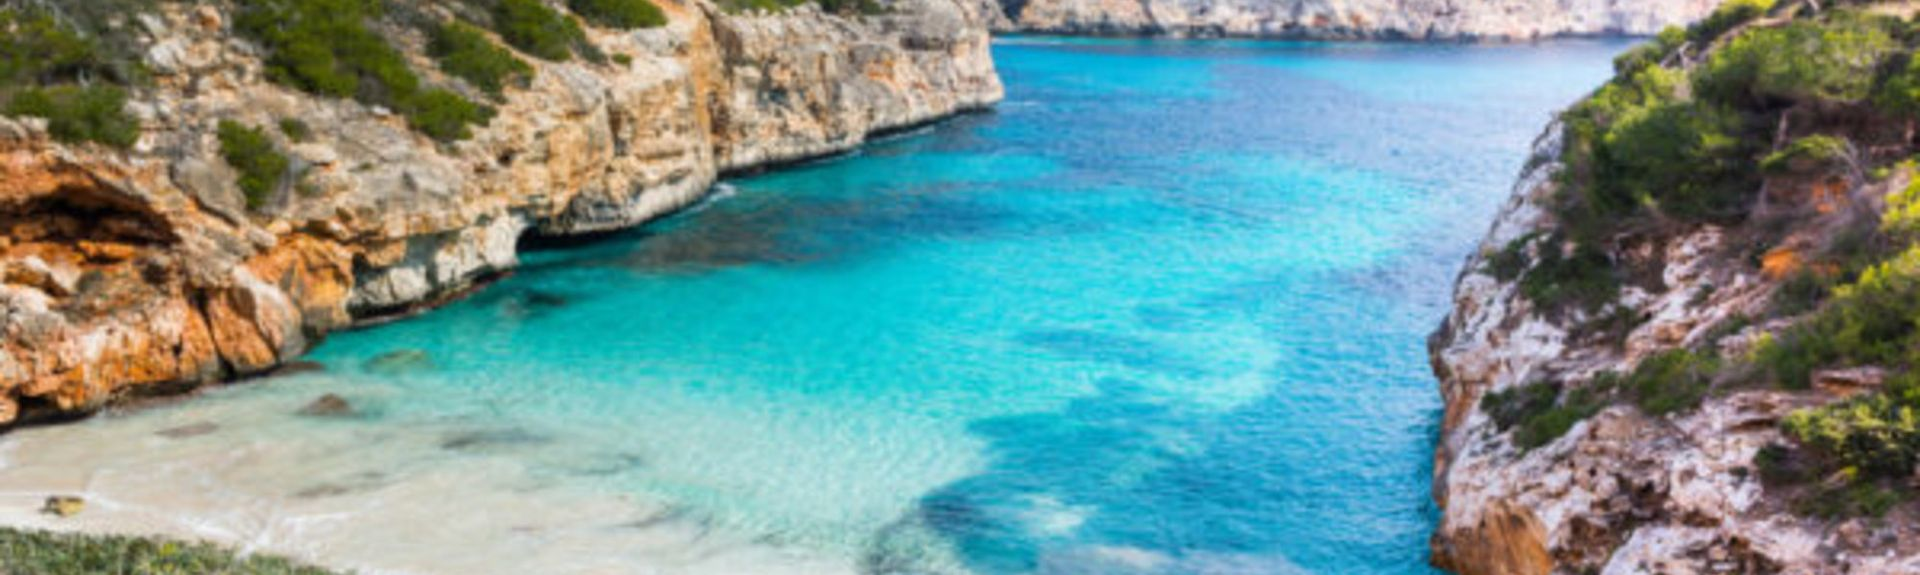 Santa Margalida, Balearic Islands, Spain